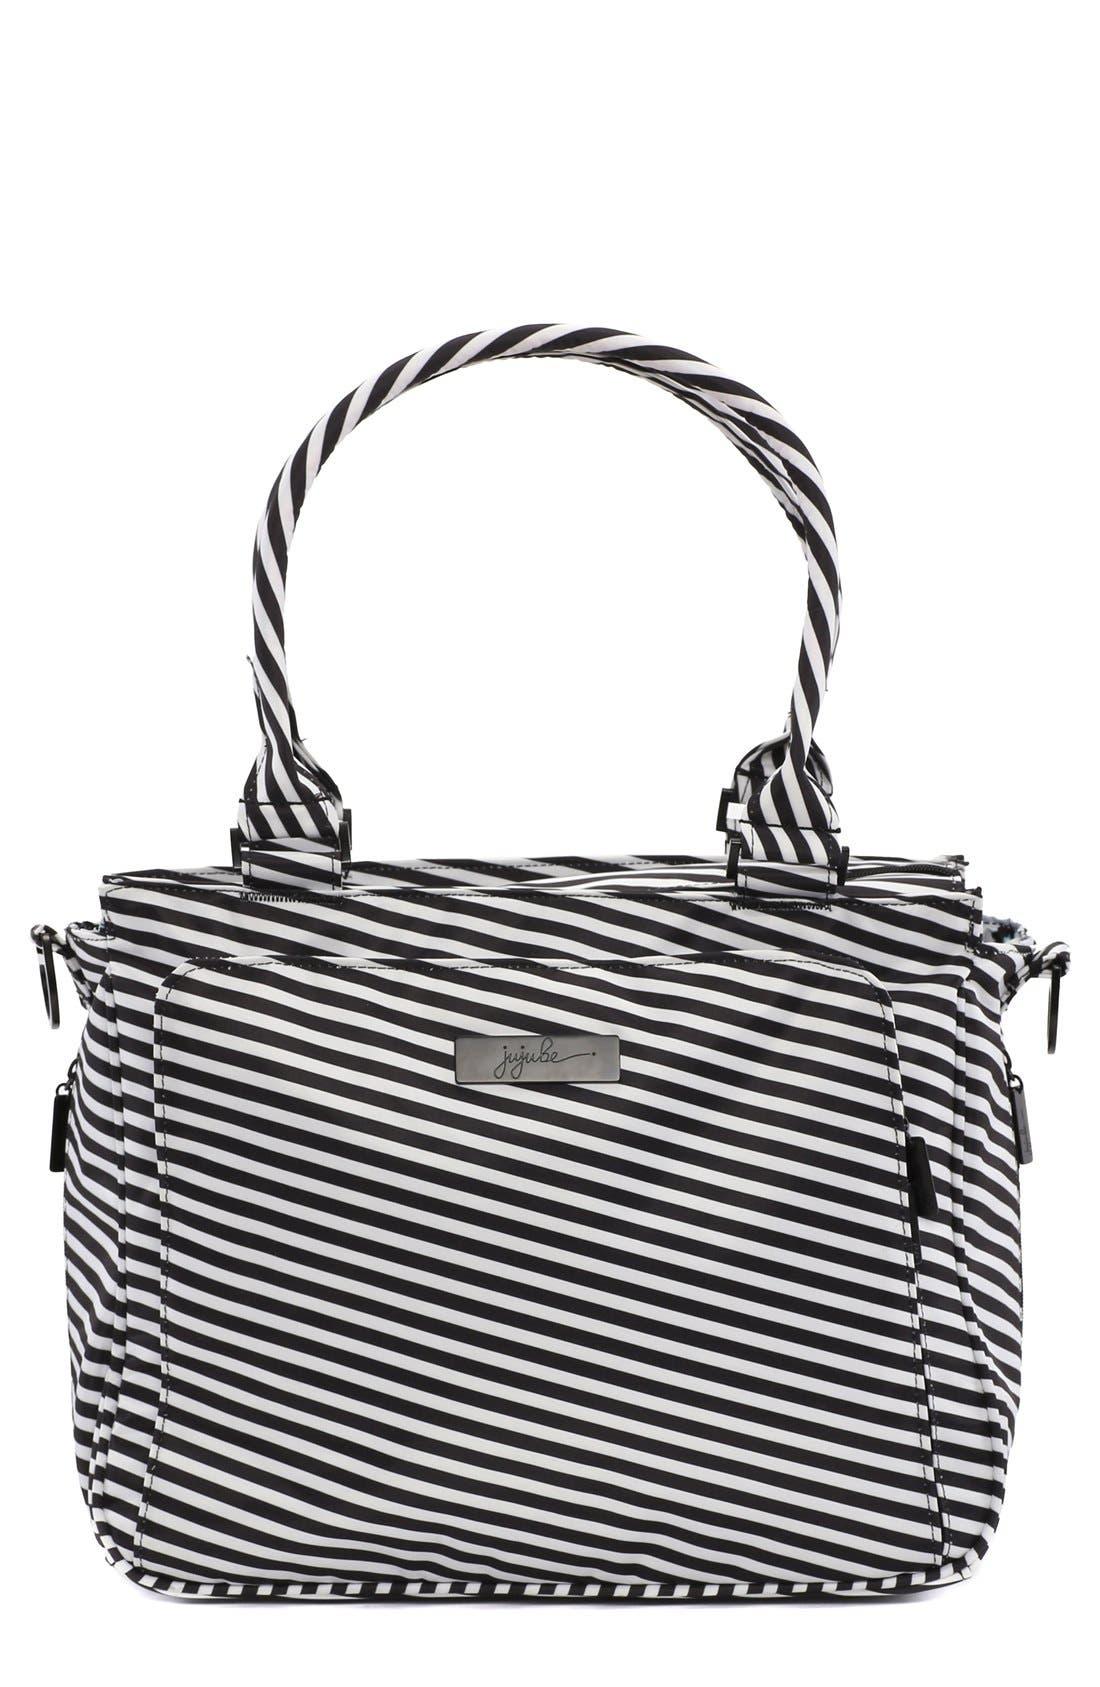 'Be Classy - Onyx Collection' Messenger Diaper Bag,                         Main,                         color, Black Magic